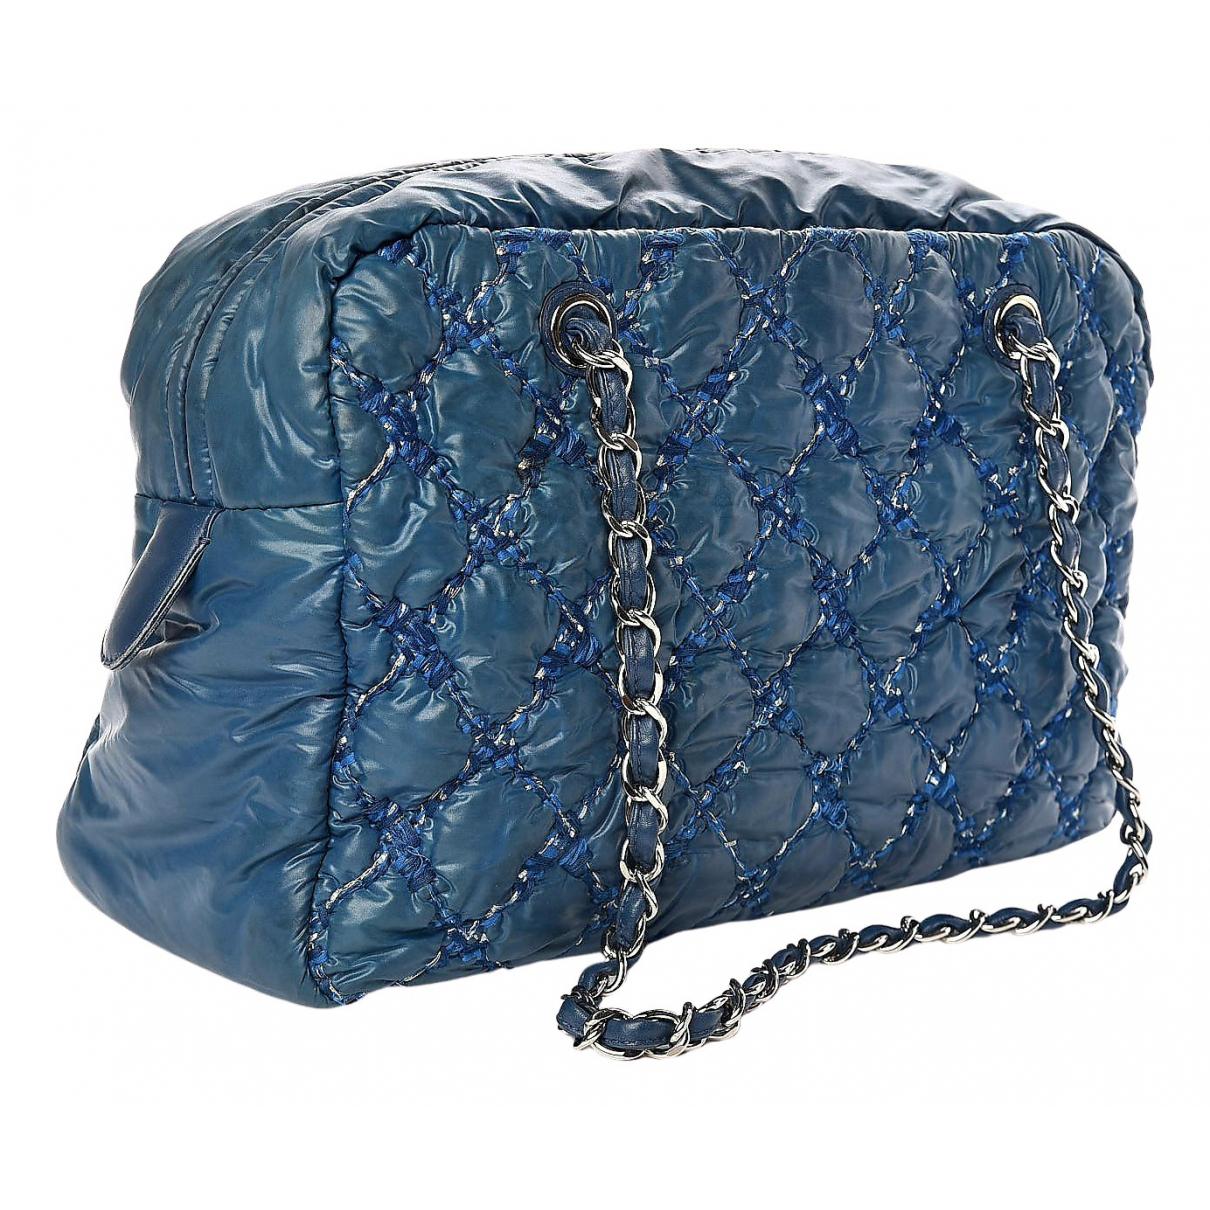 Bolso  Camera de Lona Chanel